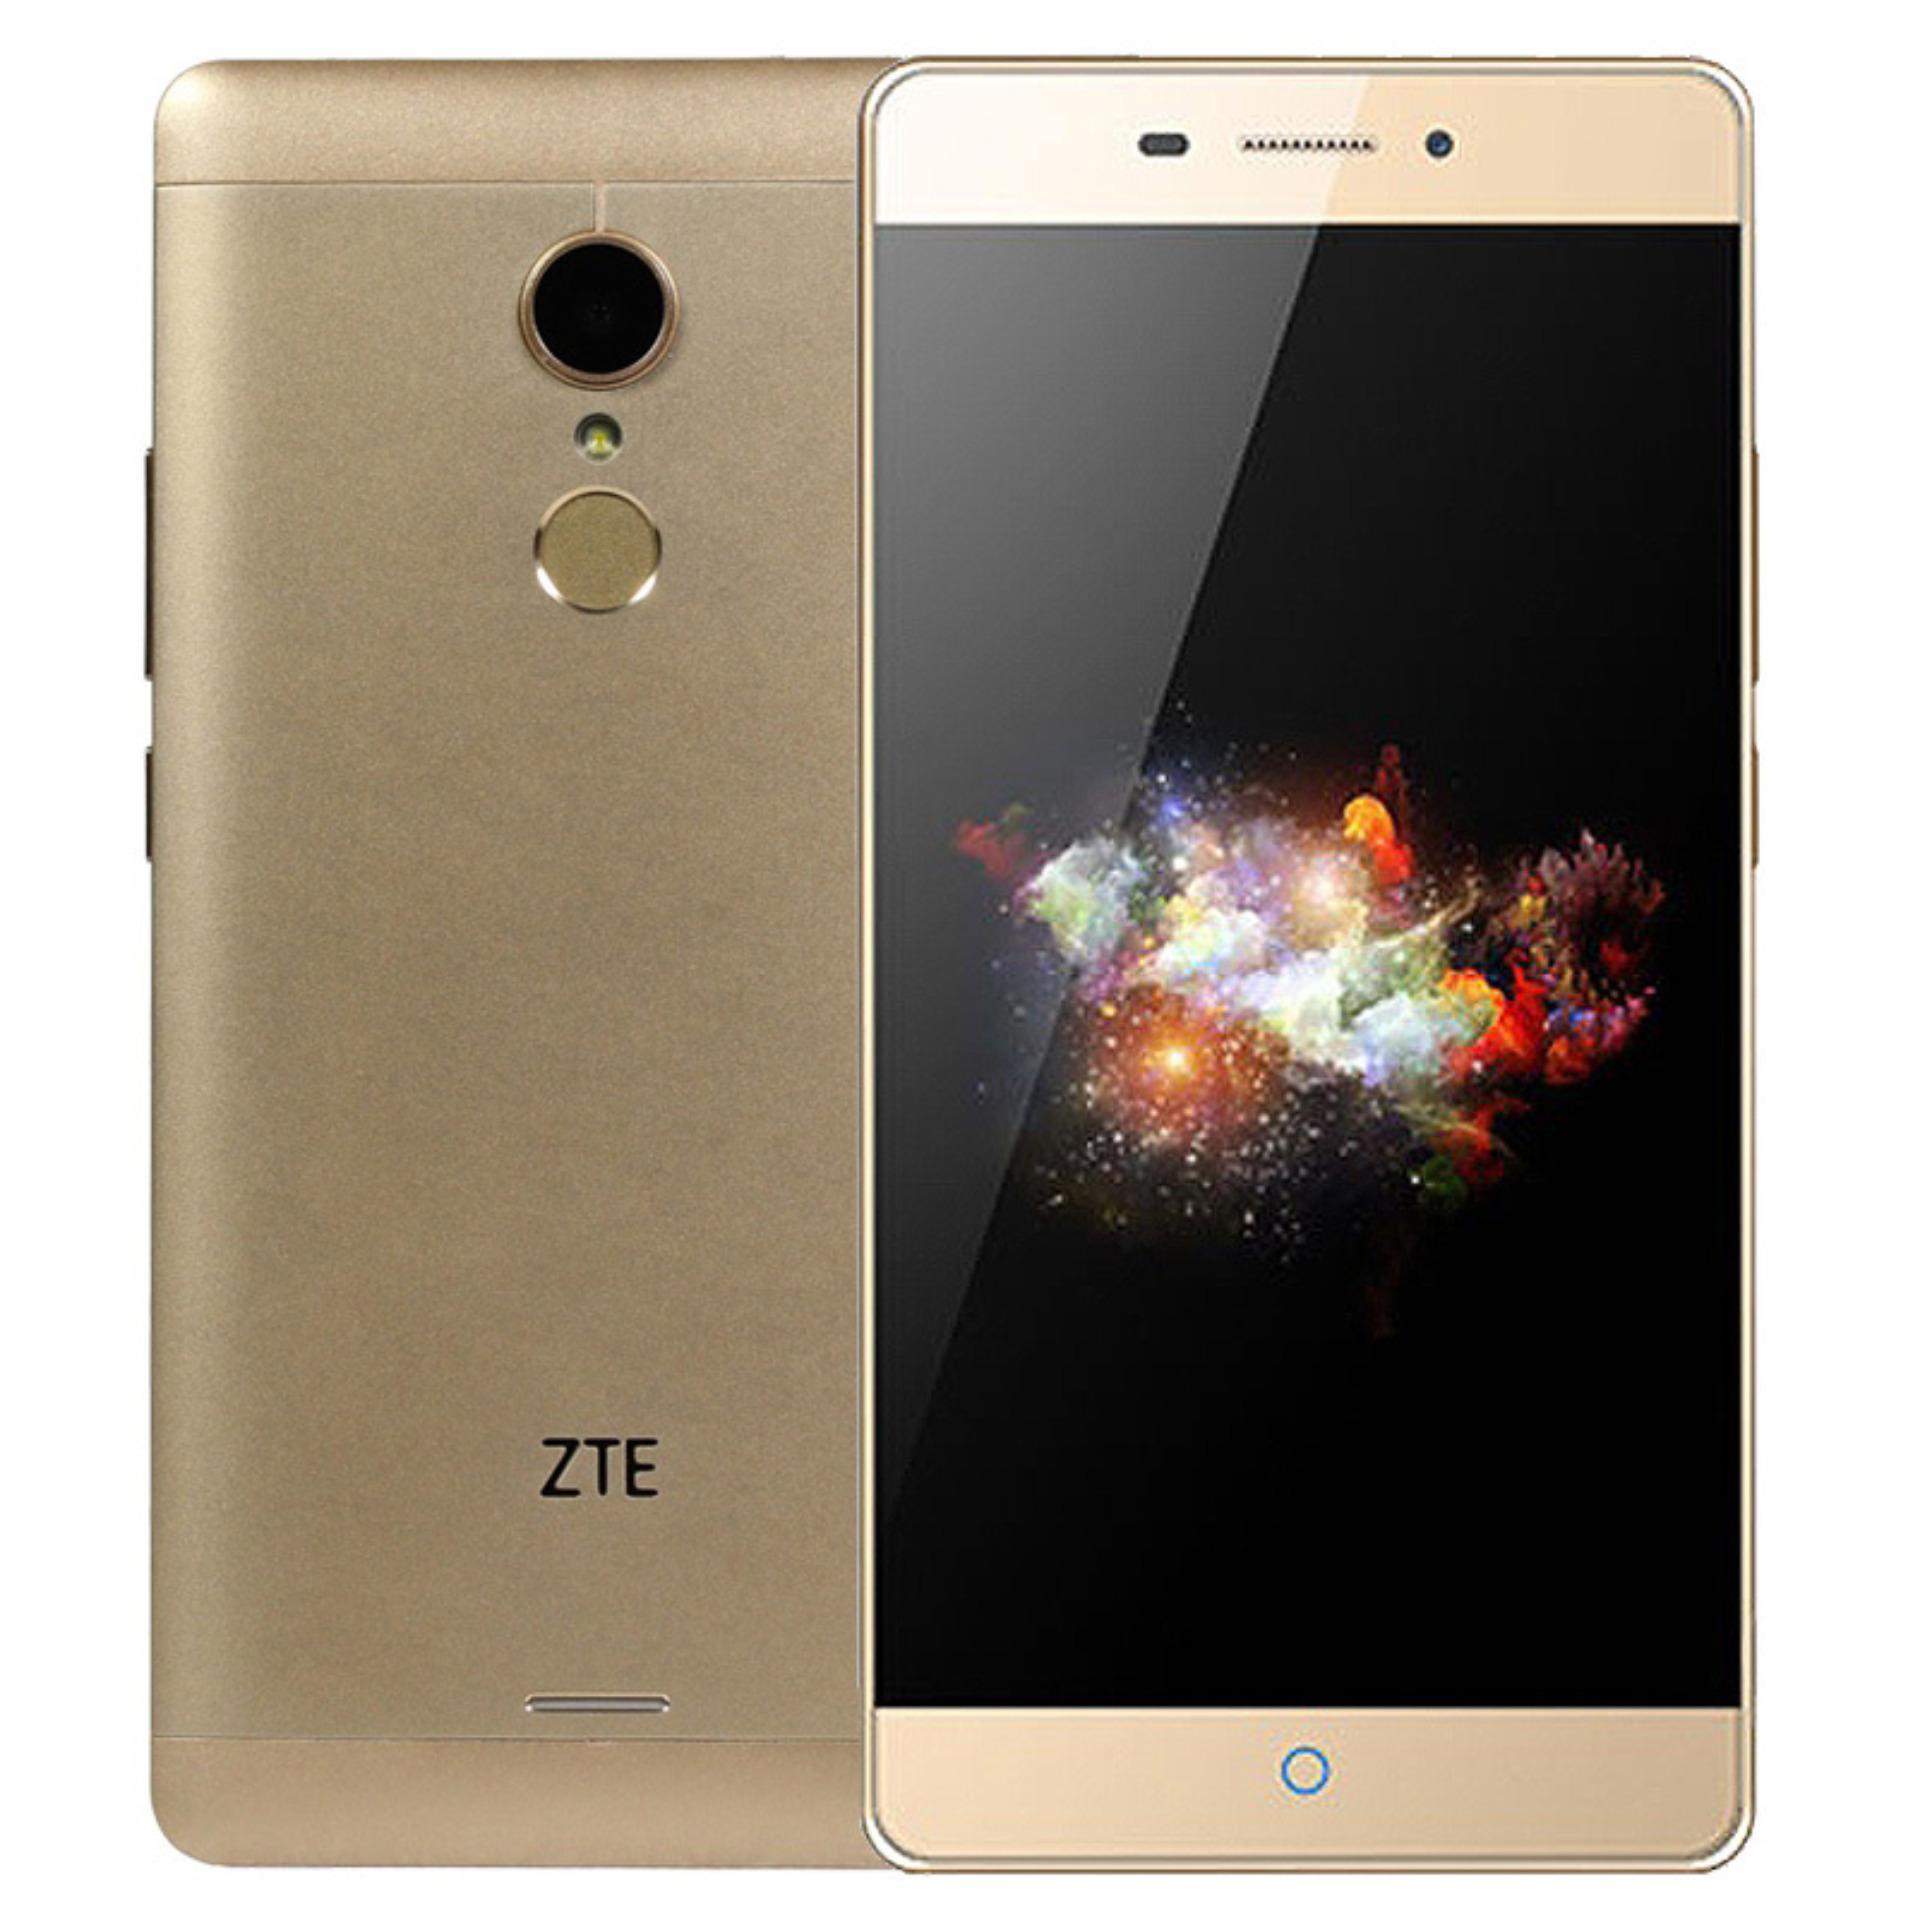 ZTE V5 Pro N939Sc/4G FDD-LTE Smartphone/2GB RAM/16GB ROM/1 MONTH WARRANTY